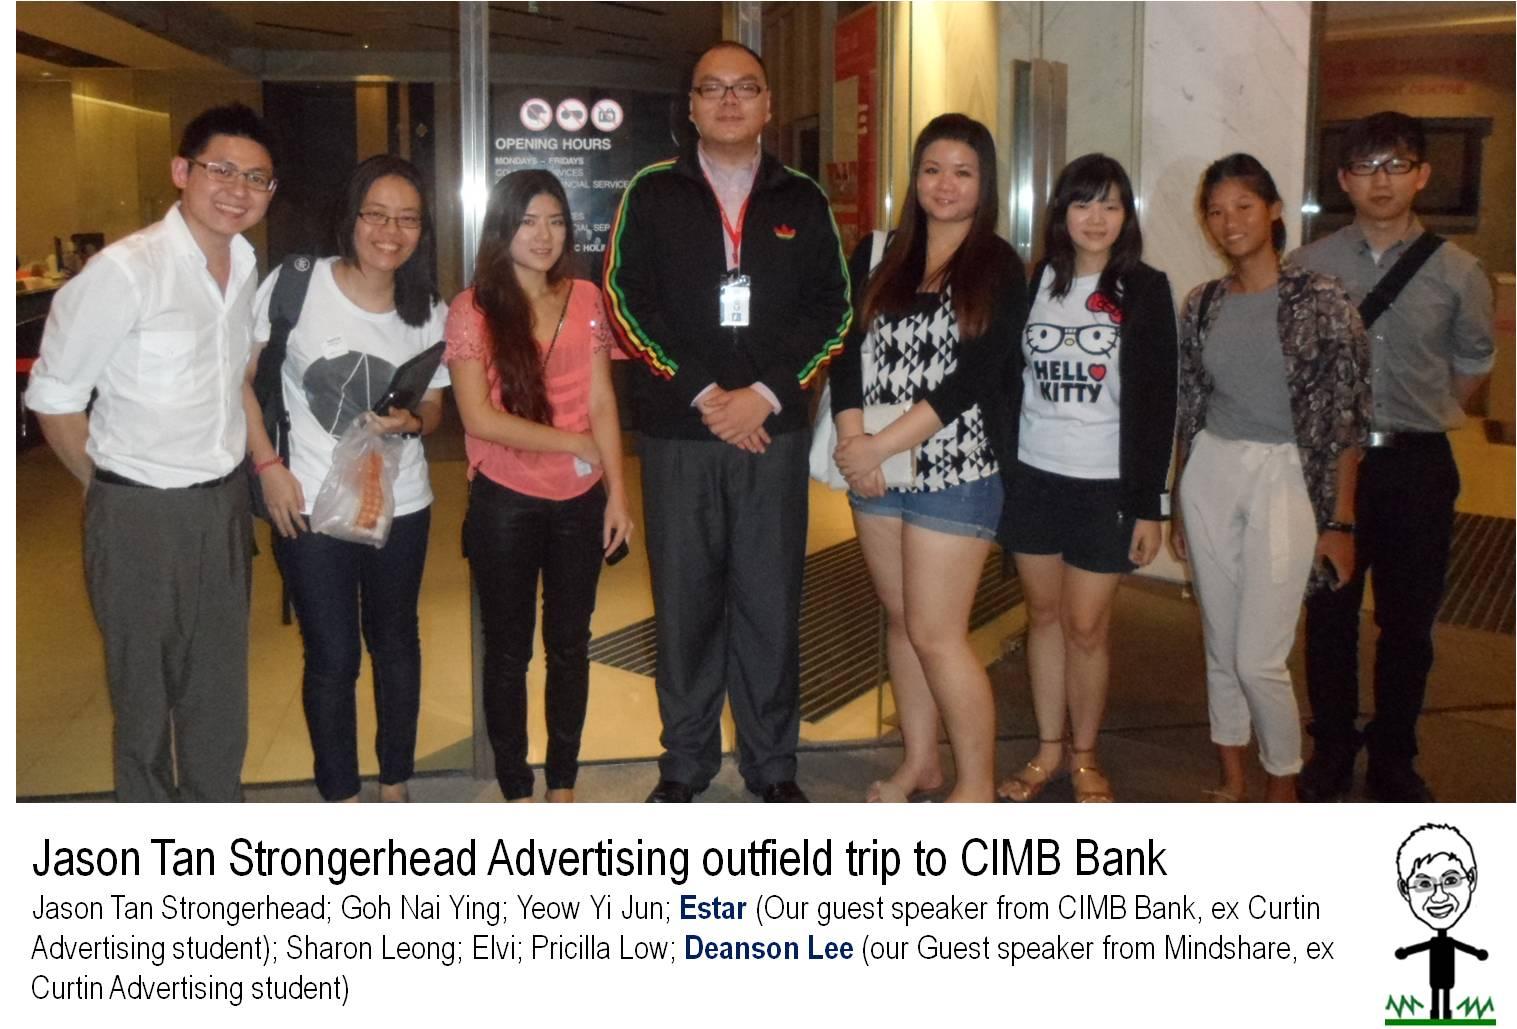 Jason Tan Strongerhead Advertising outfield trip to CIMB bank